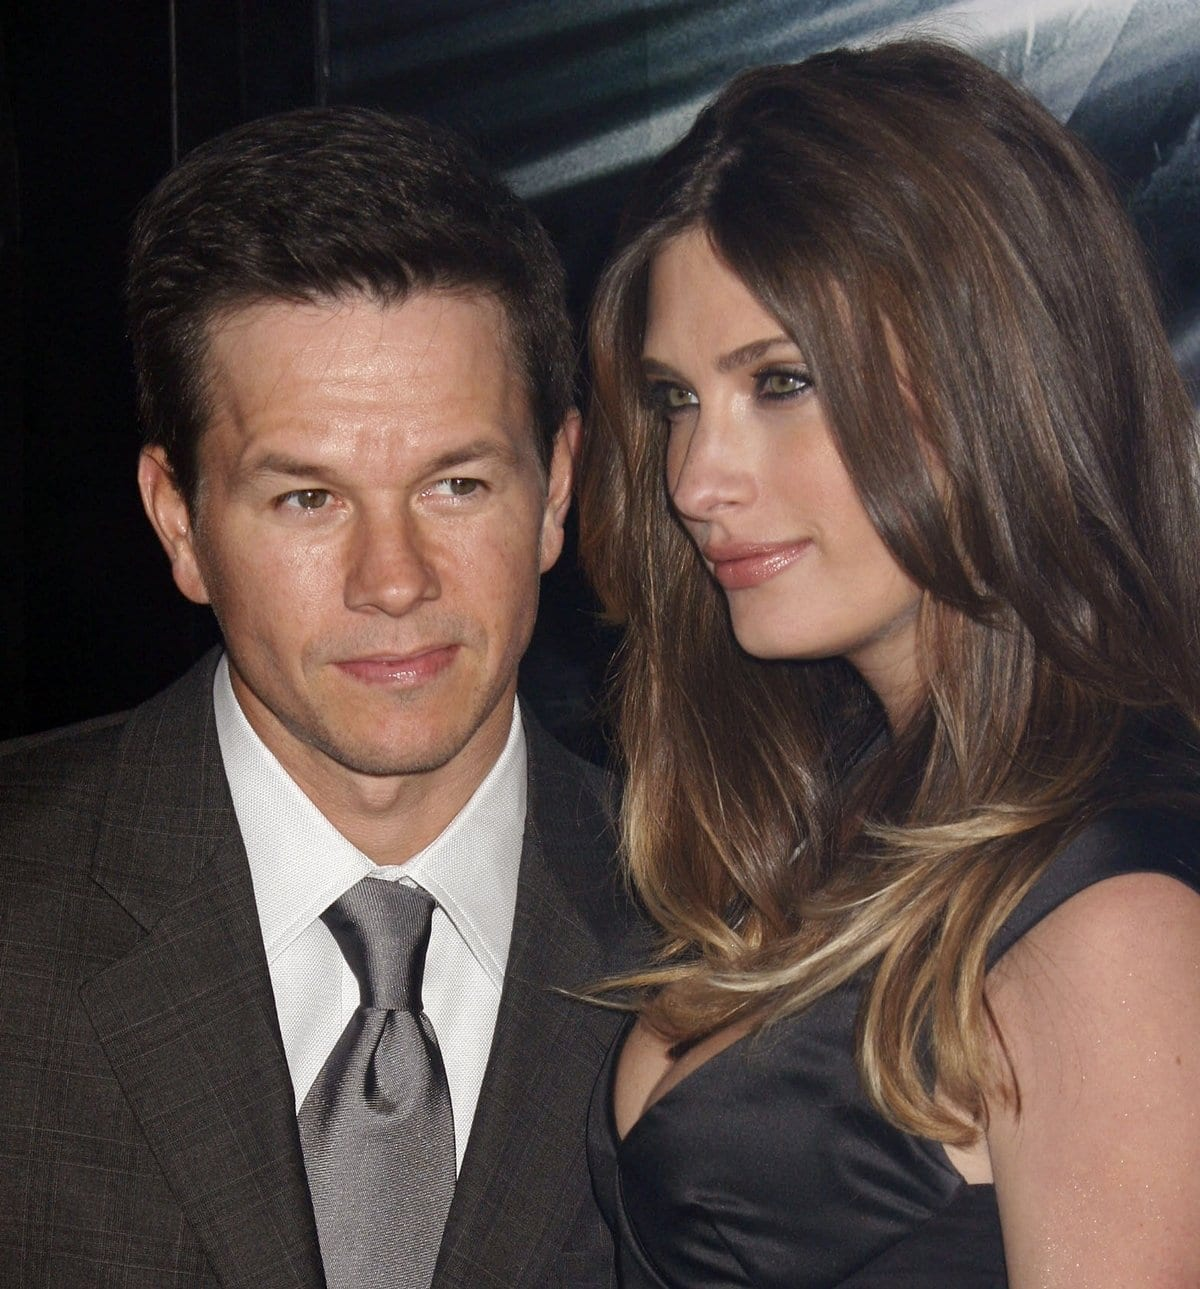 Mark Wahlberg met his taller wife Rhea Durham at a press junket in New York in 2001